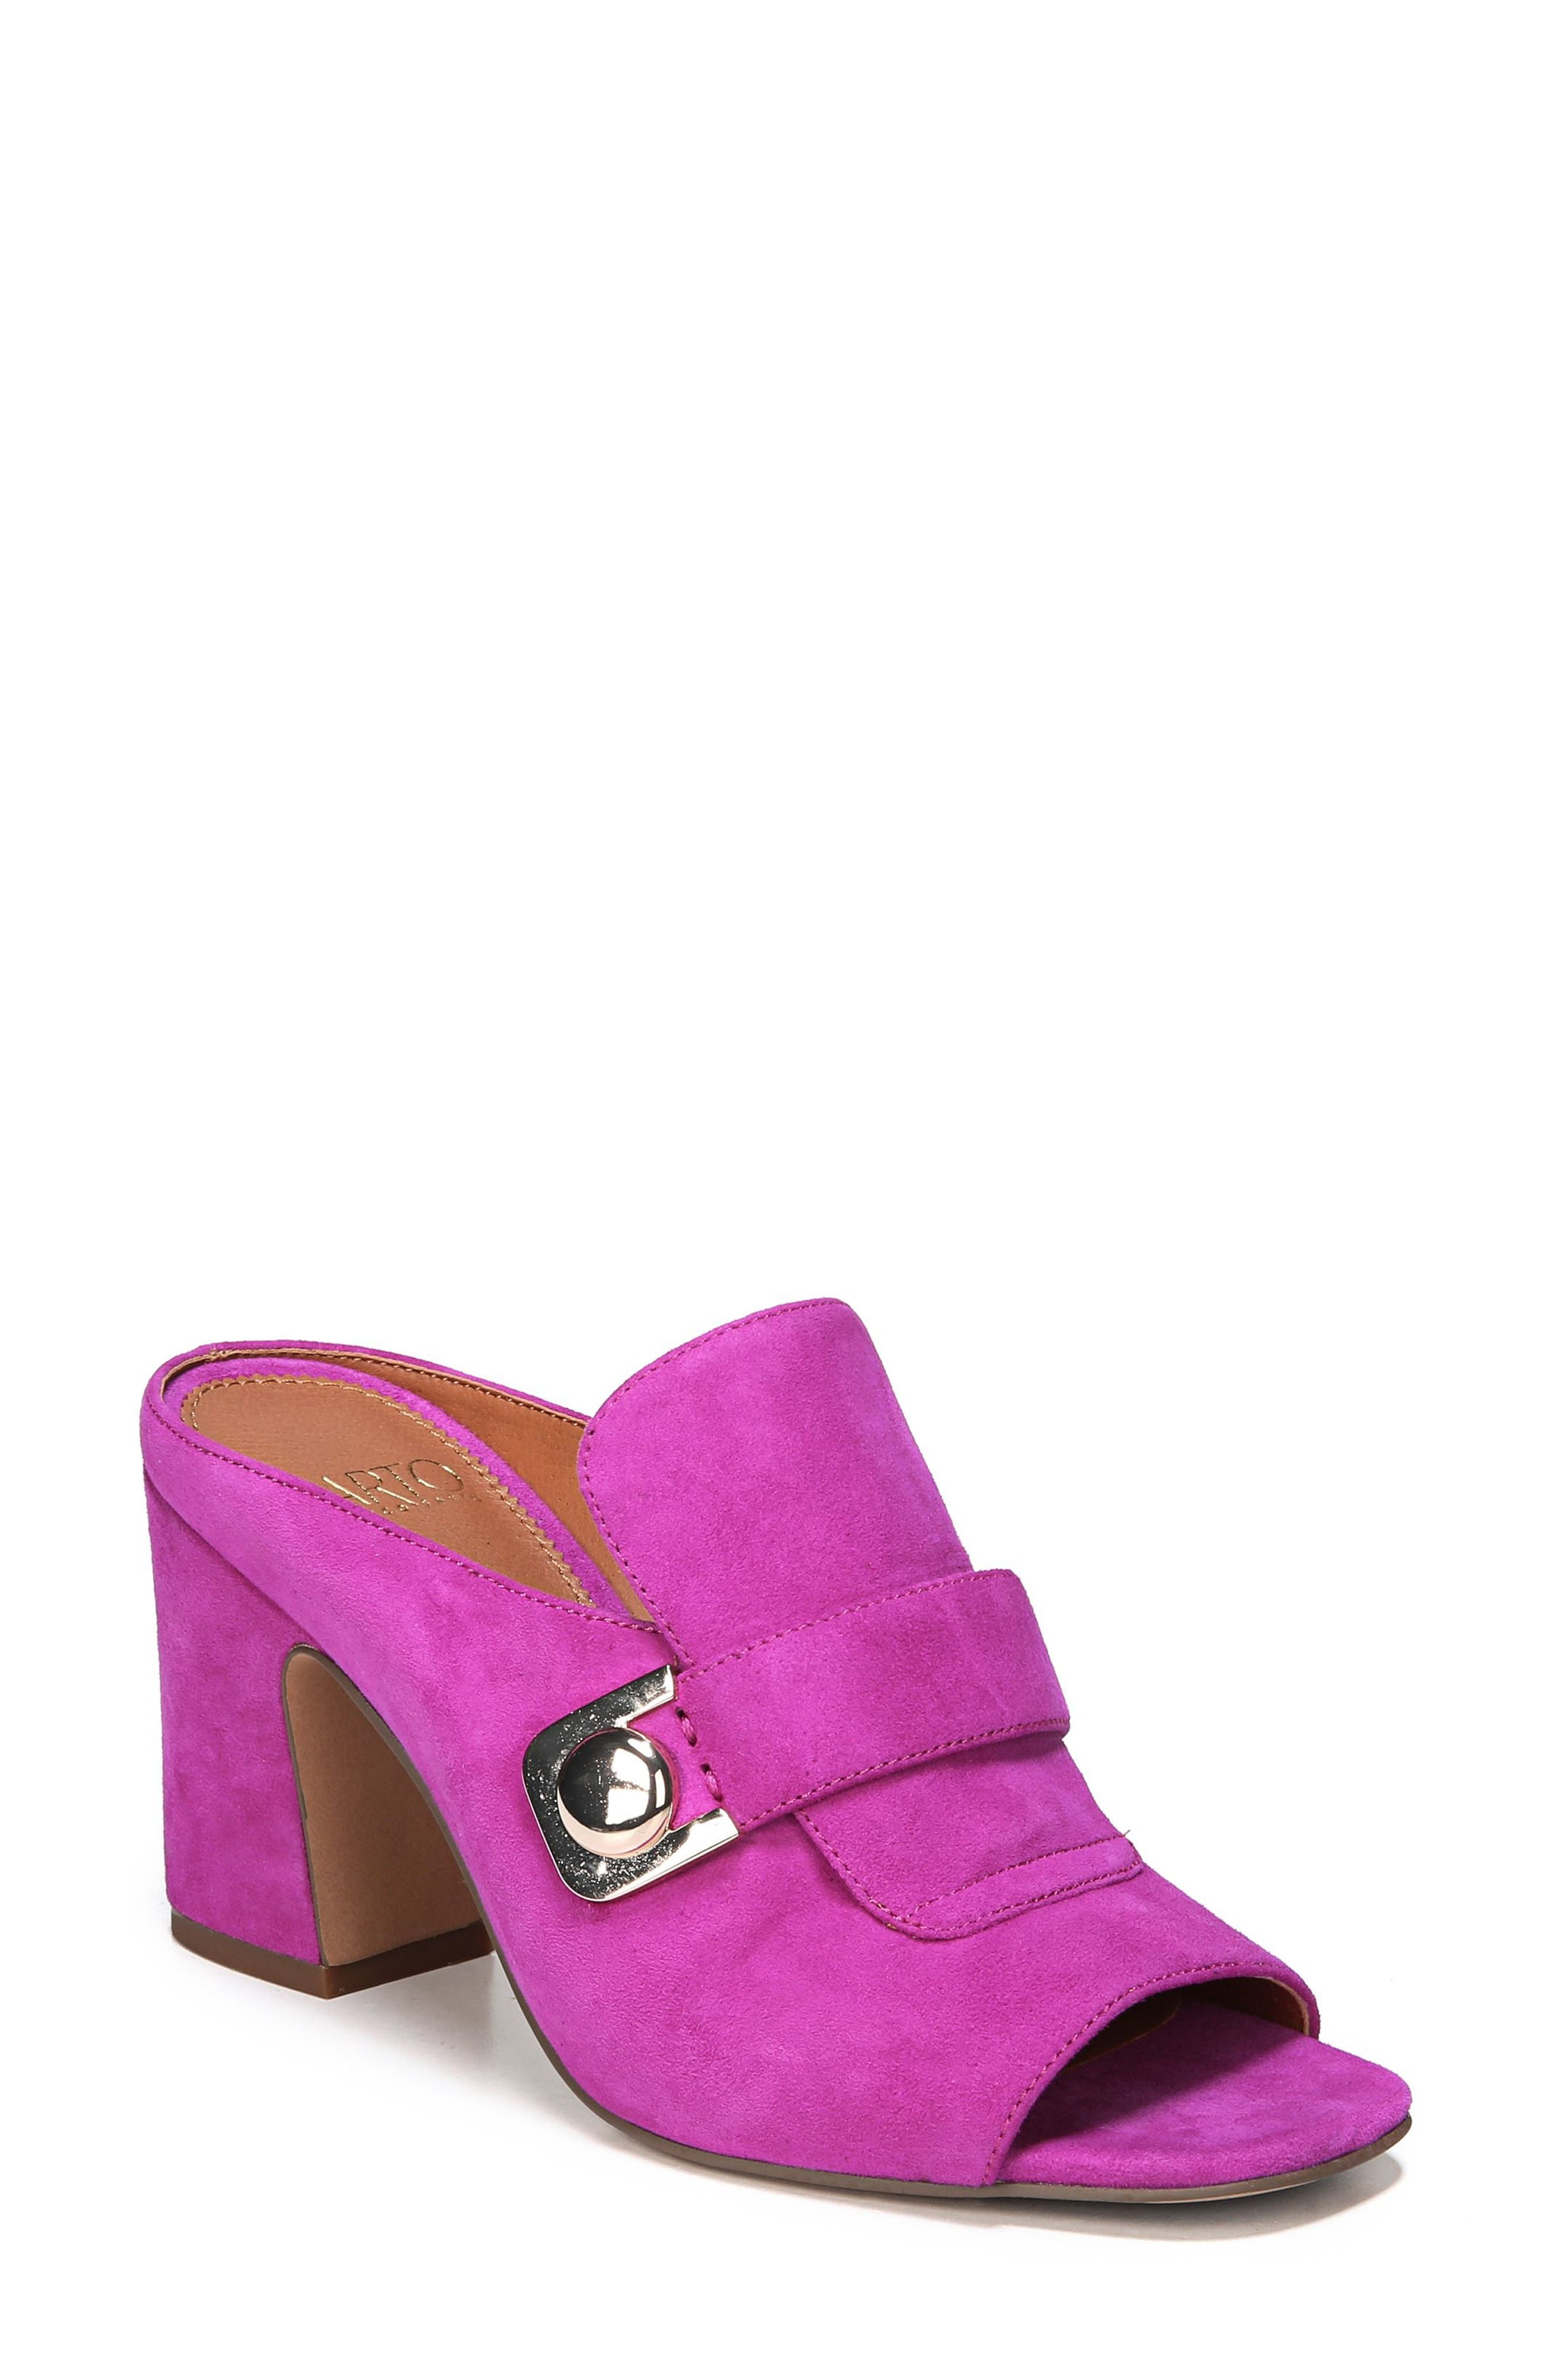 Alternate Image 1 Selected - SARTO by Franco Sarto Rosalie Block Heel Sandal (Women)